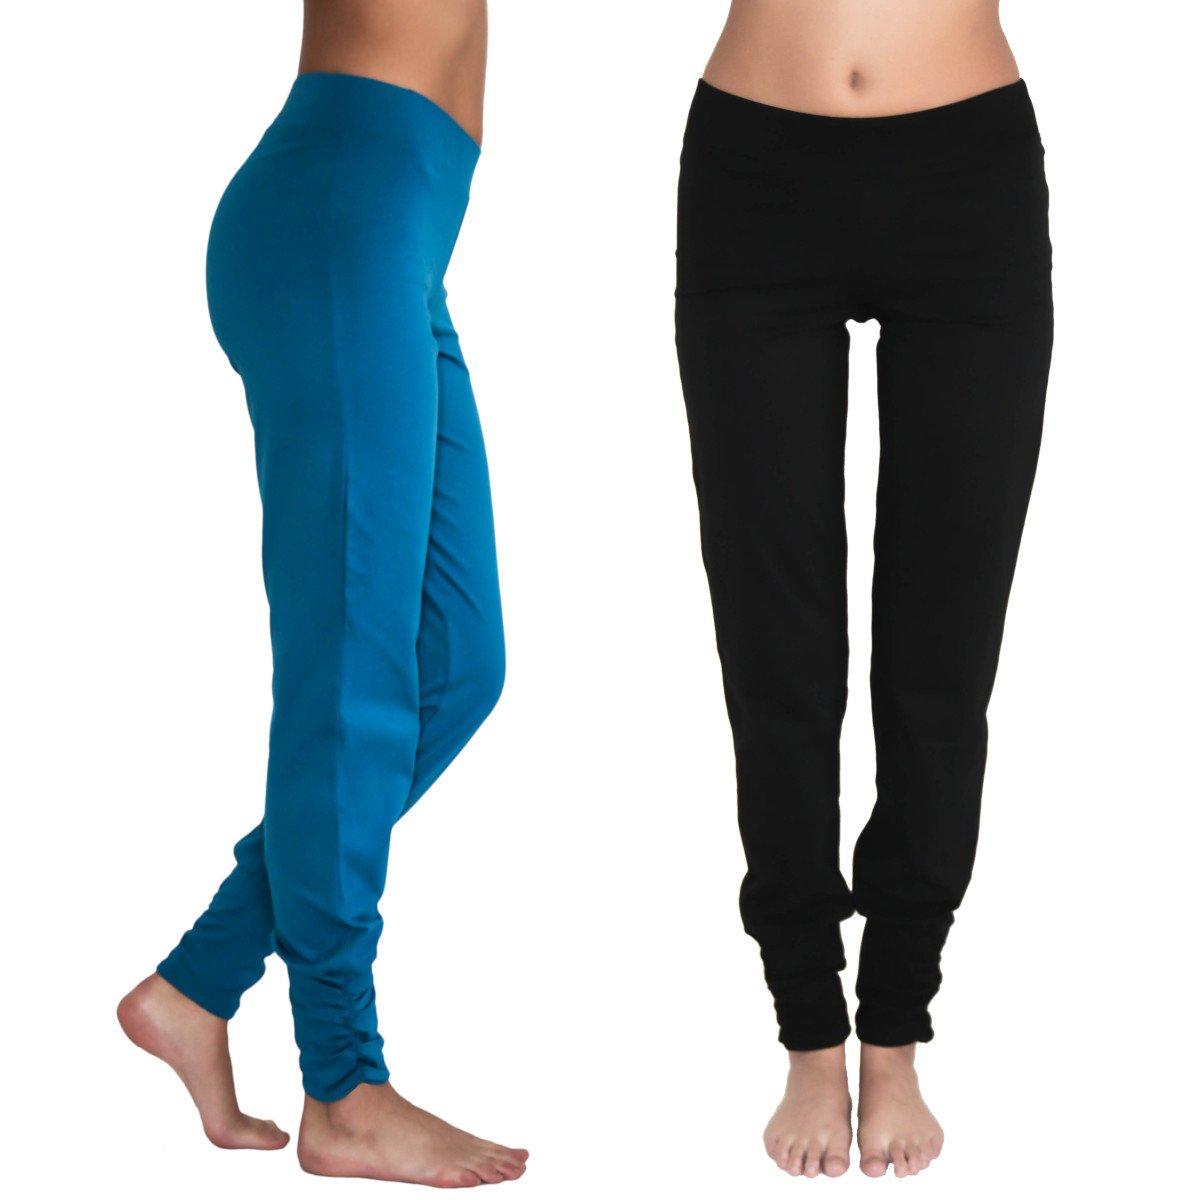 Pantalone Yoga in cotone biologico Leela Cotton